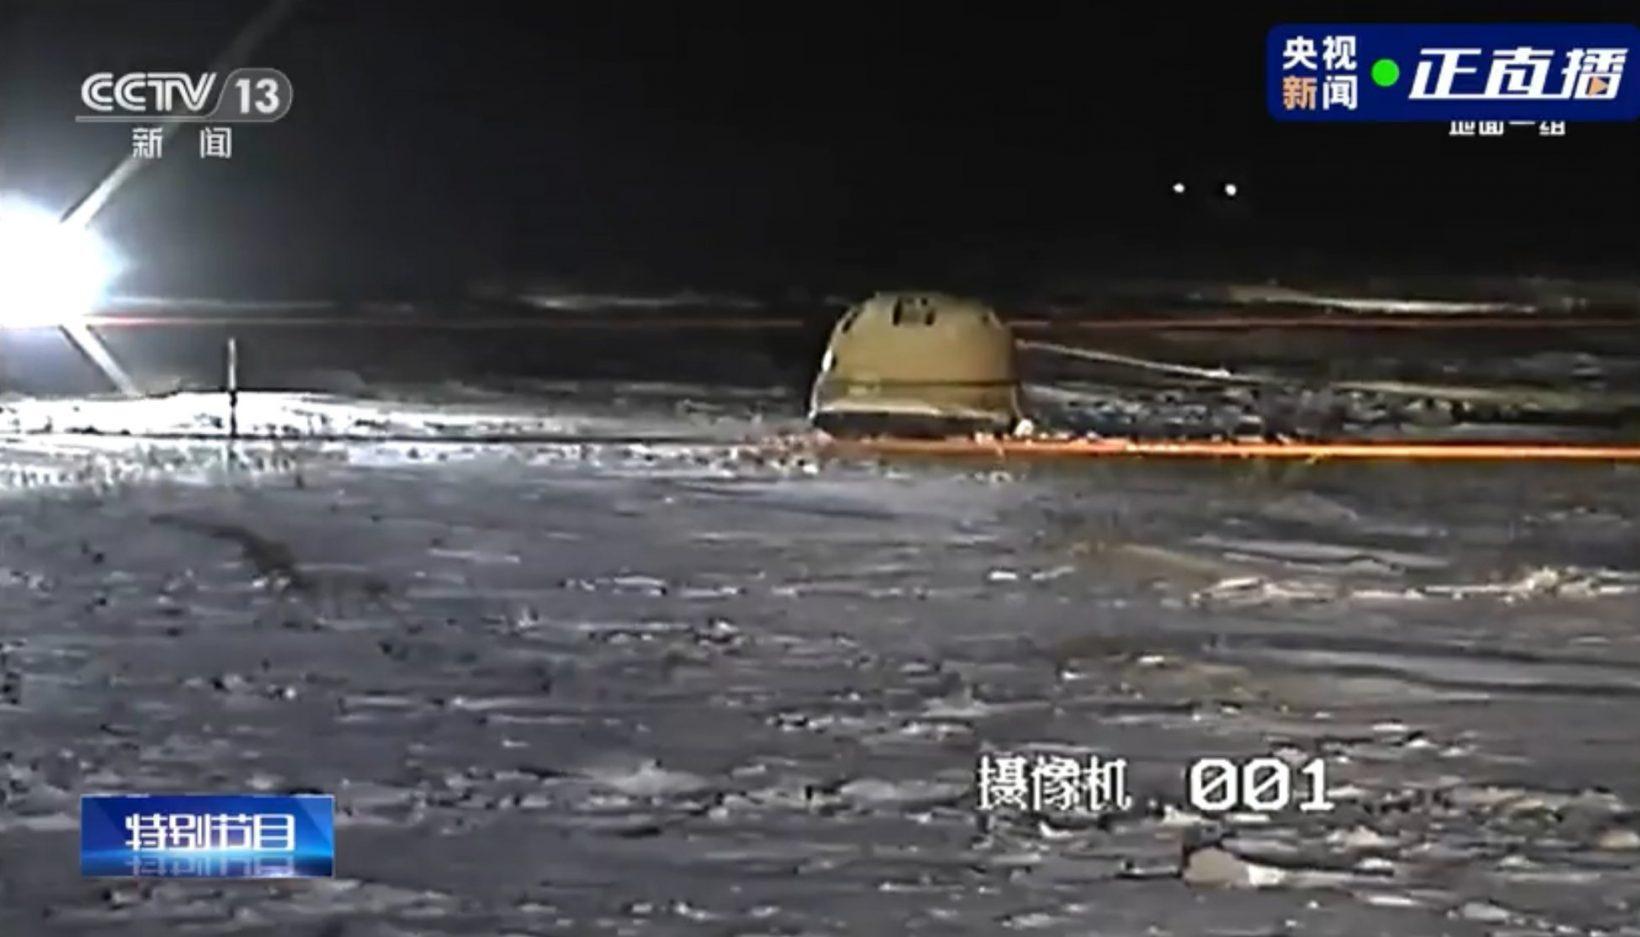 Rentry capsule found